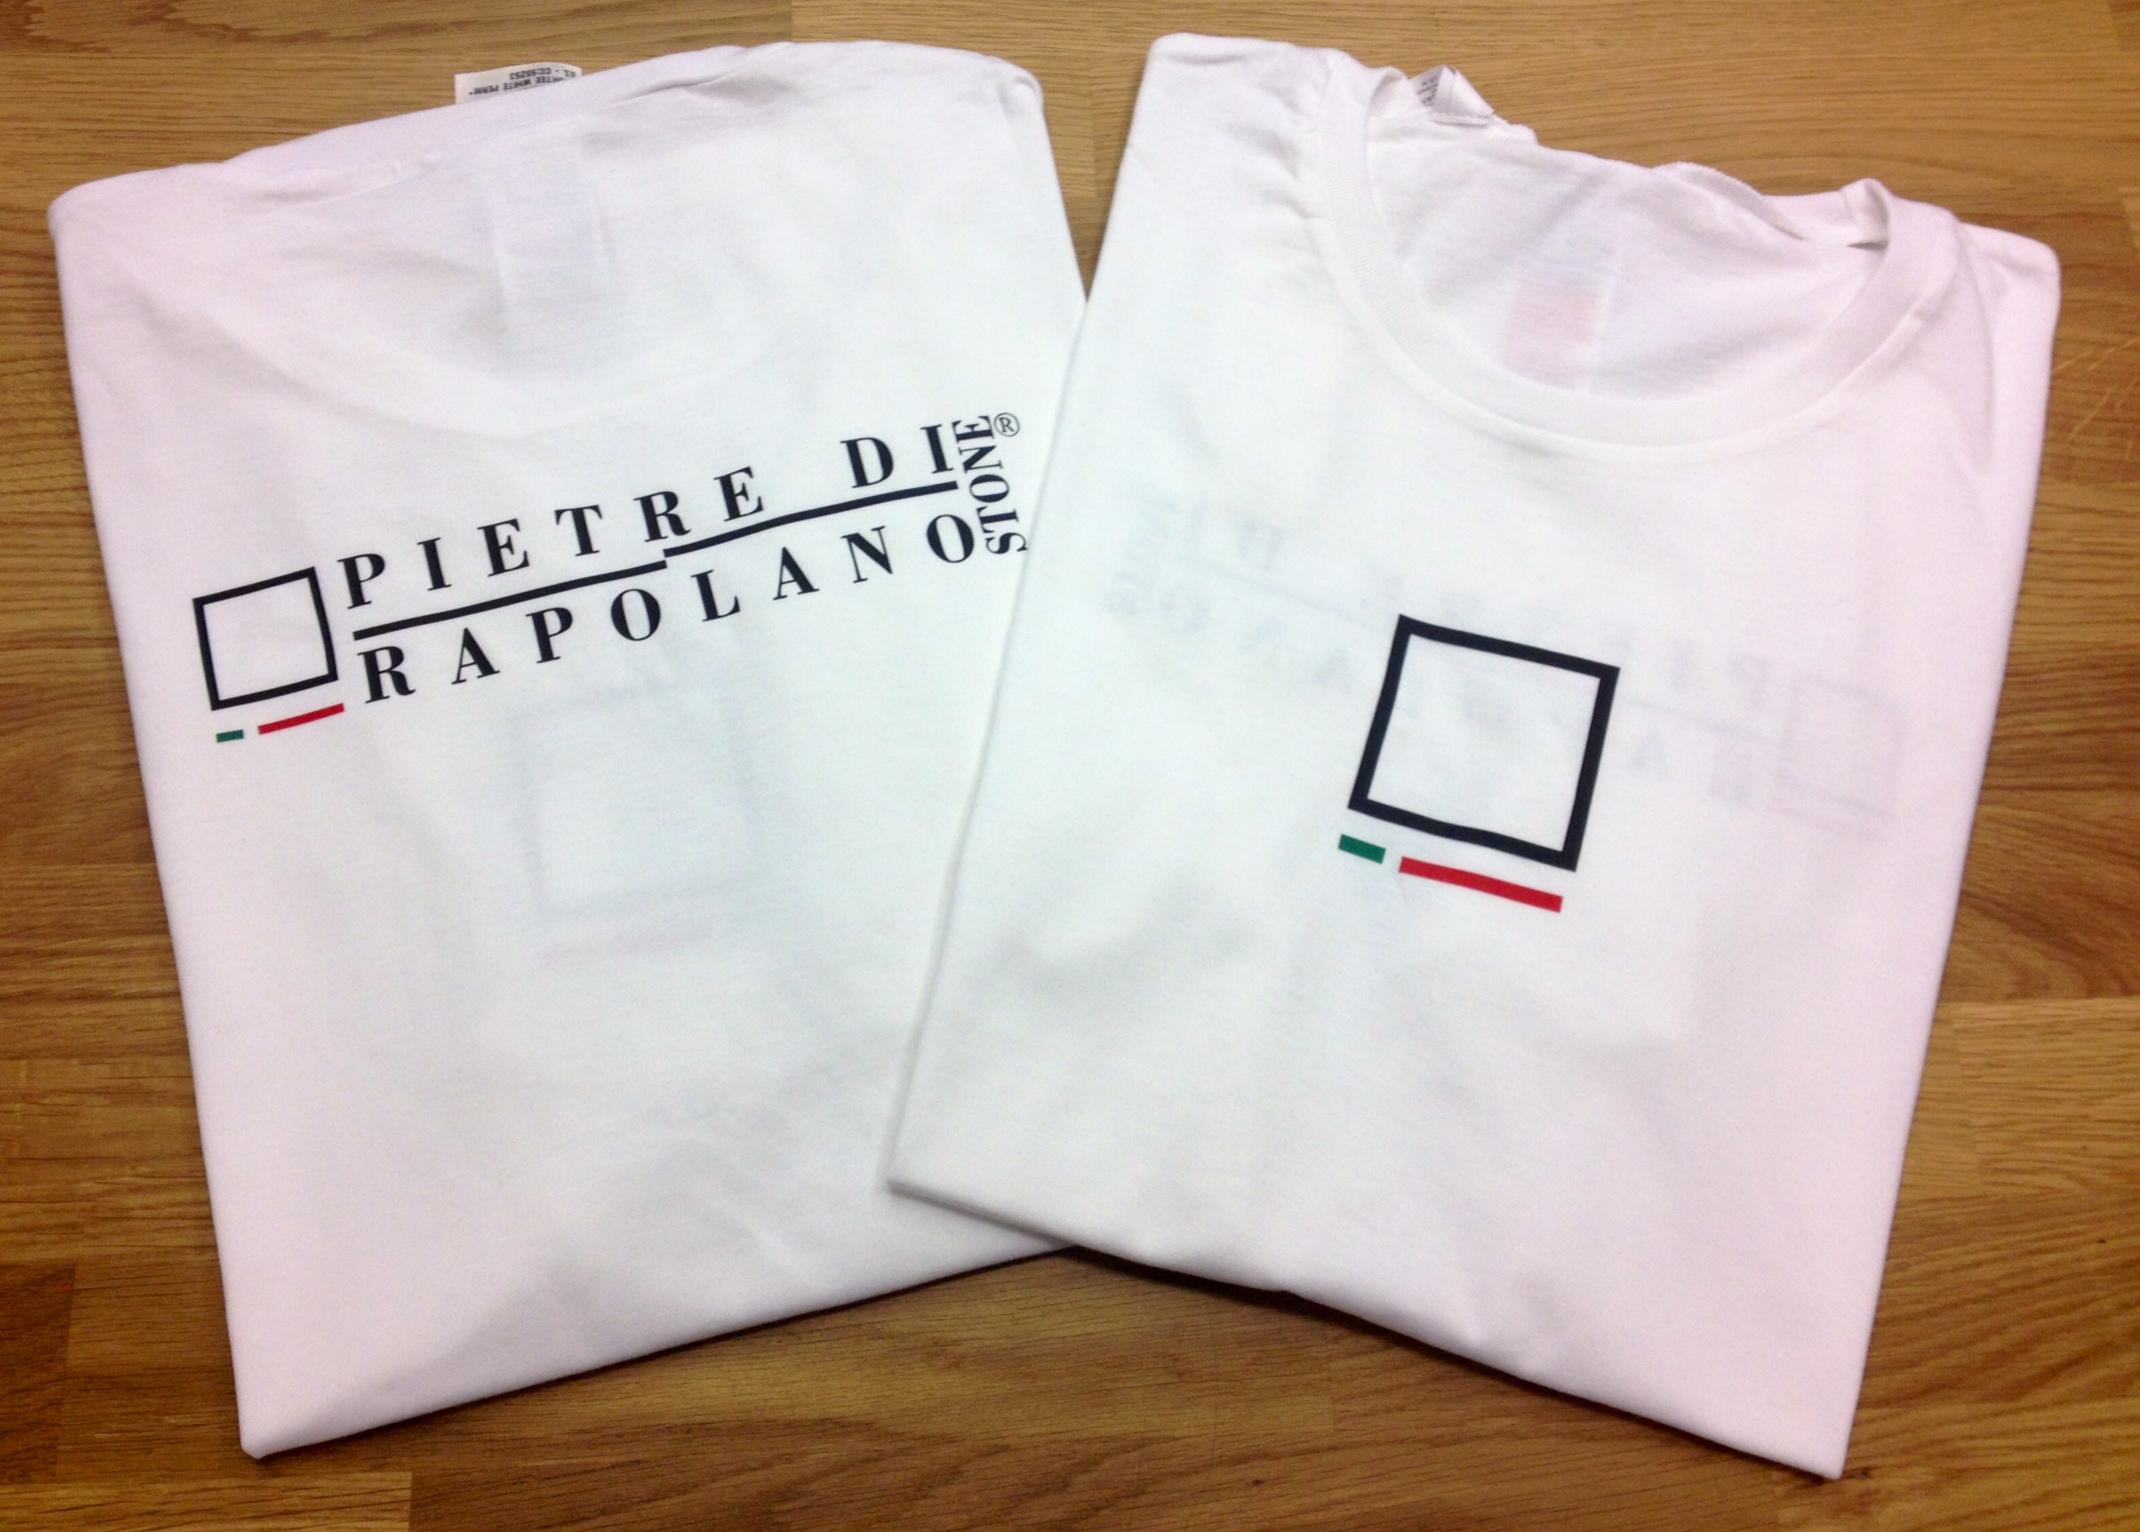 Pietre di rapolano t-shirts